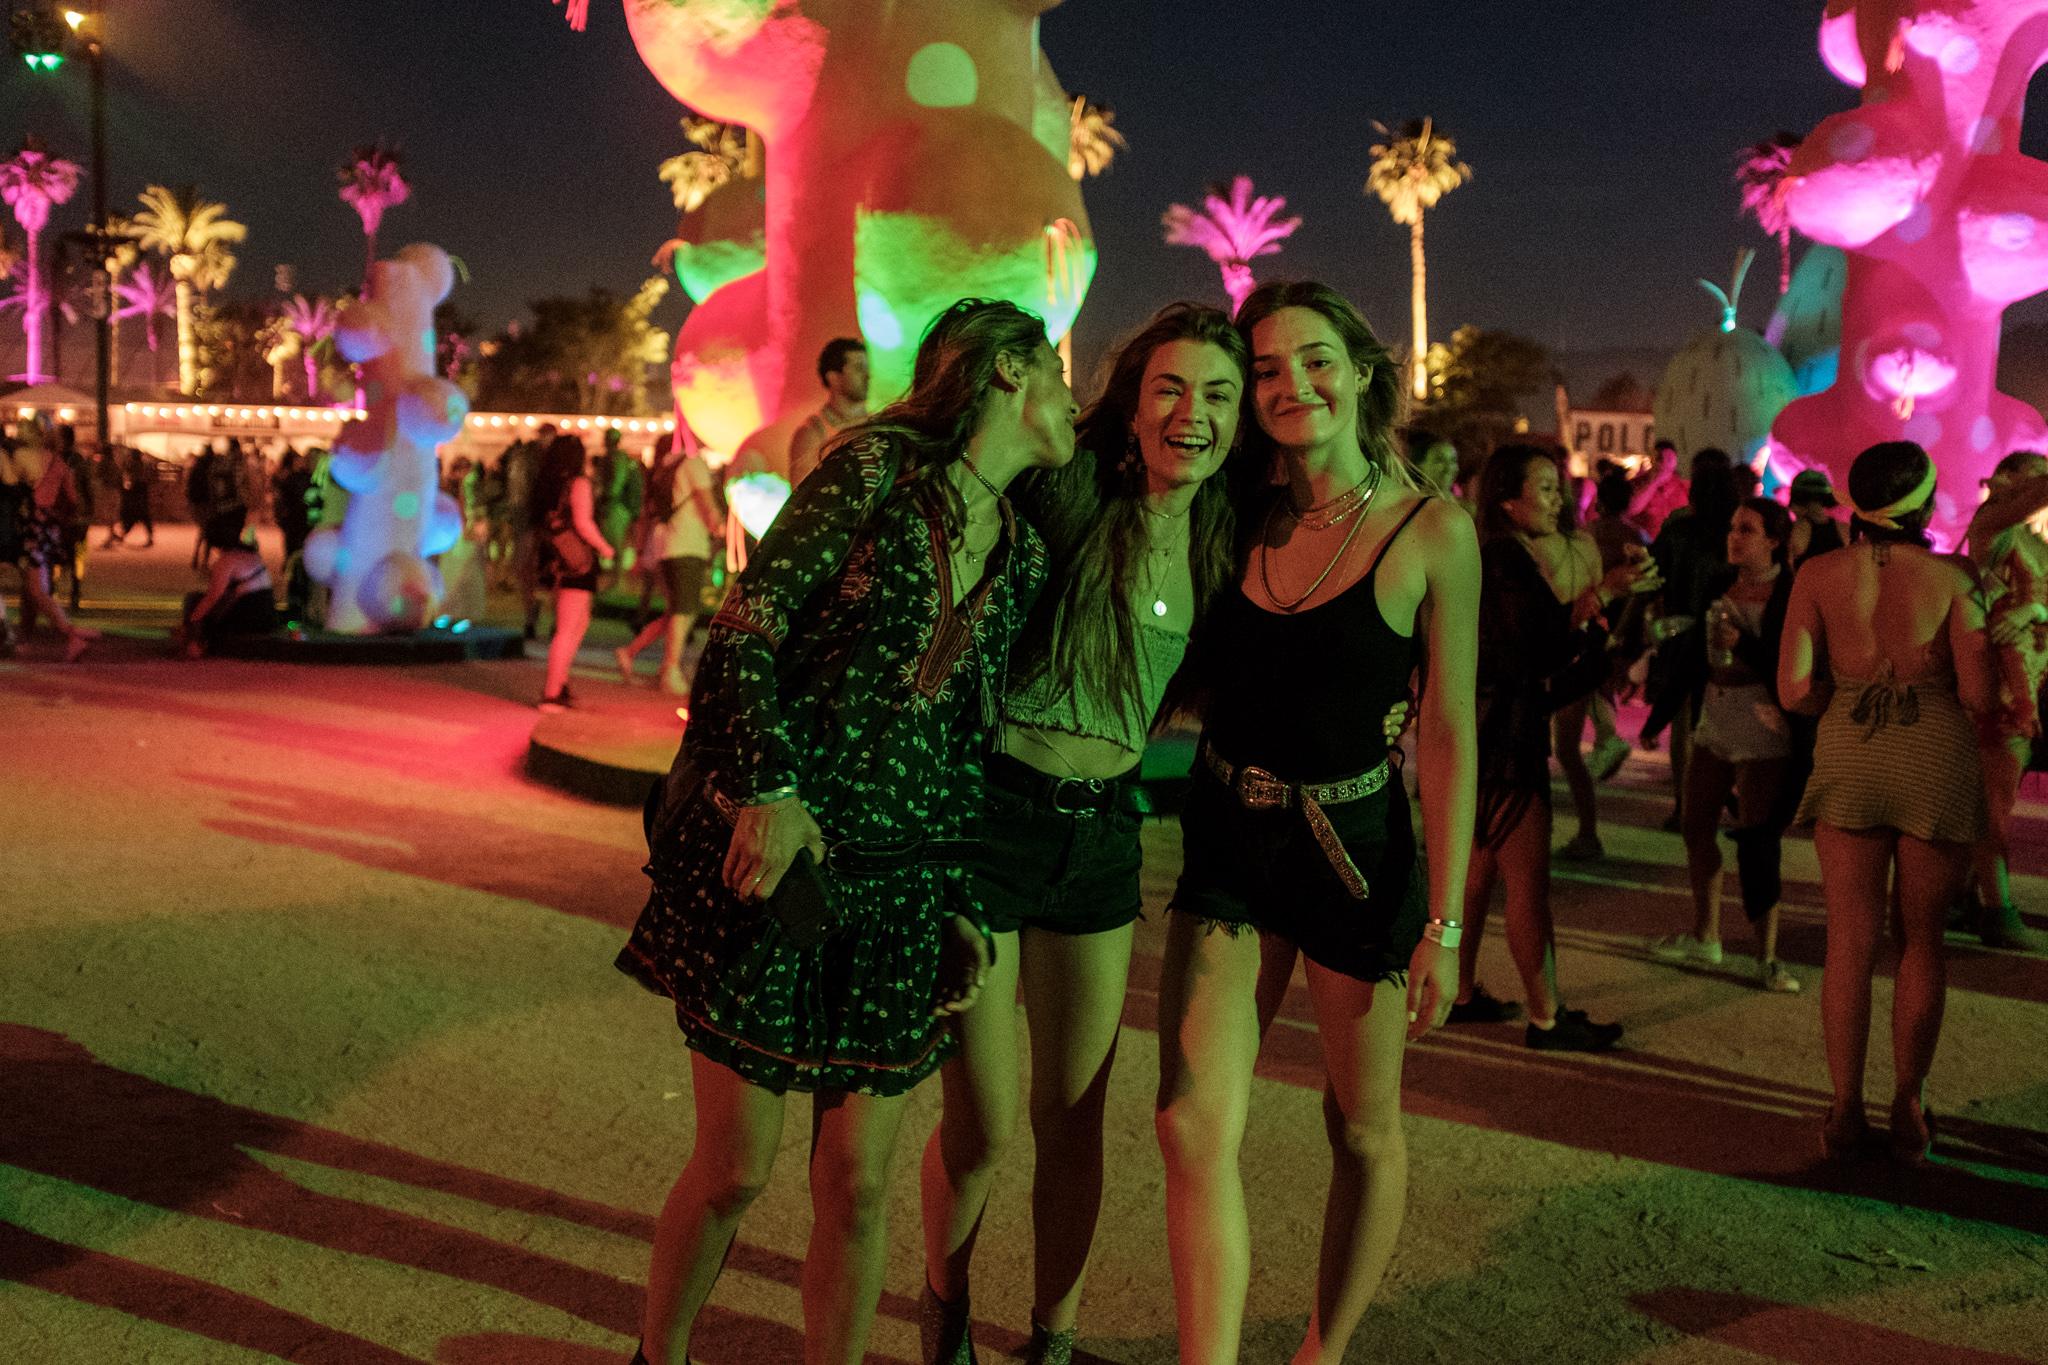 170423 Coachella 17 w2 2154.jpg